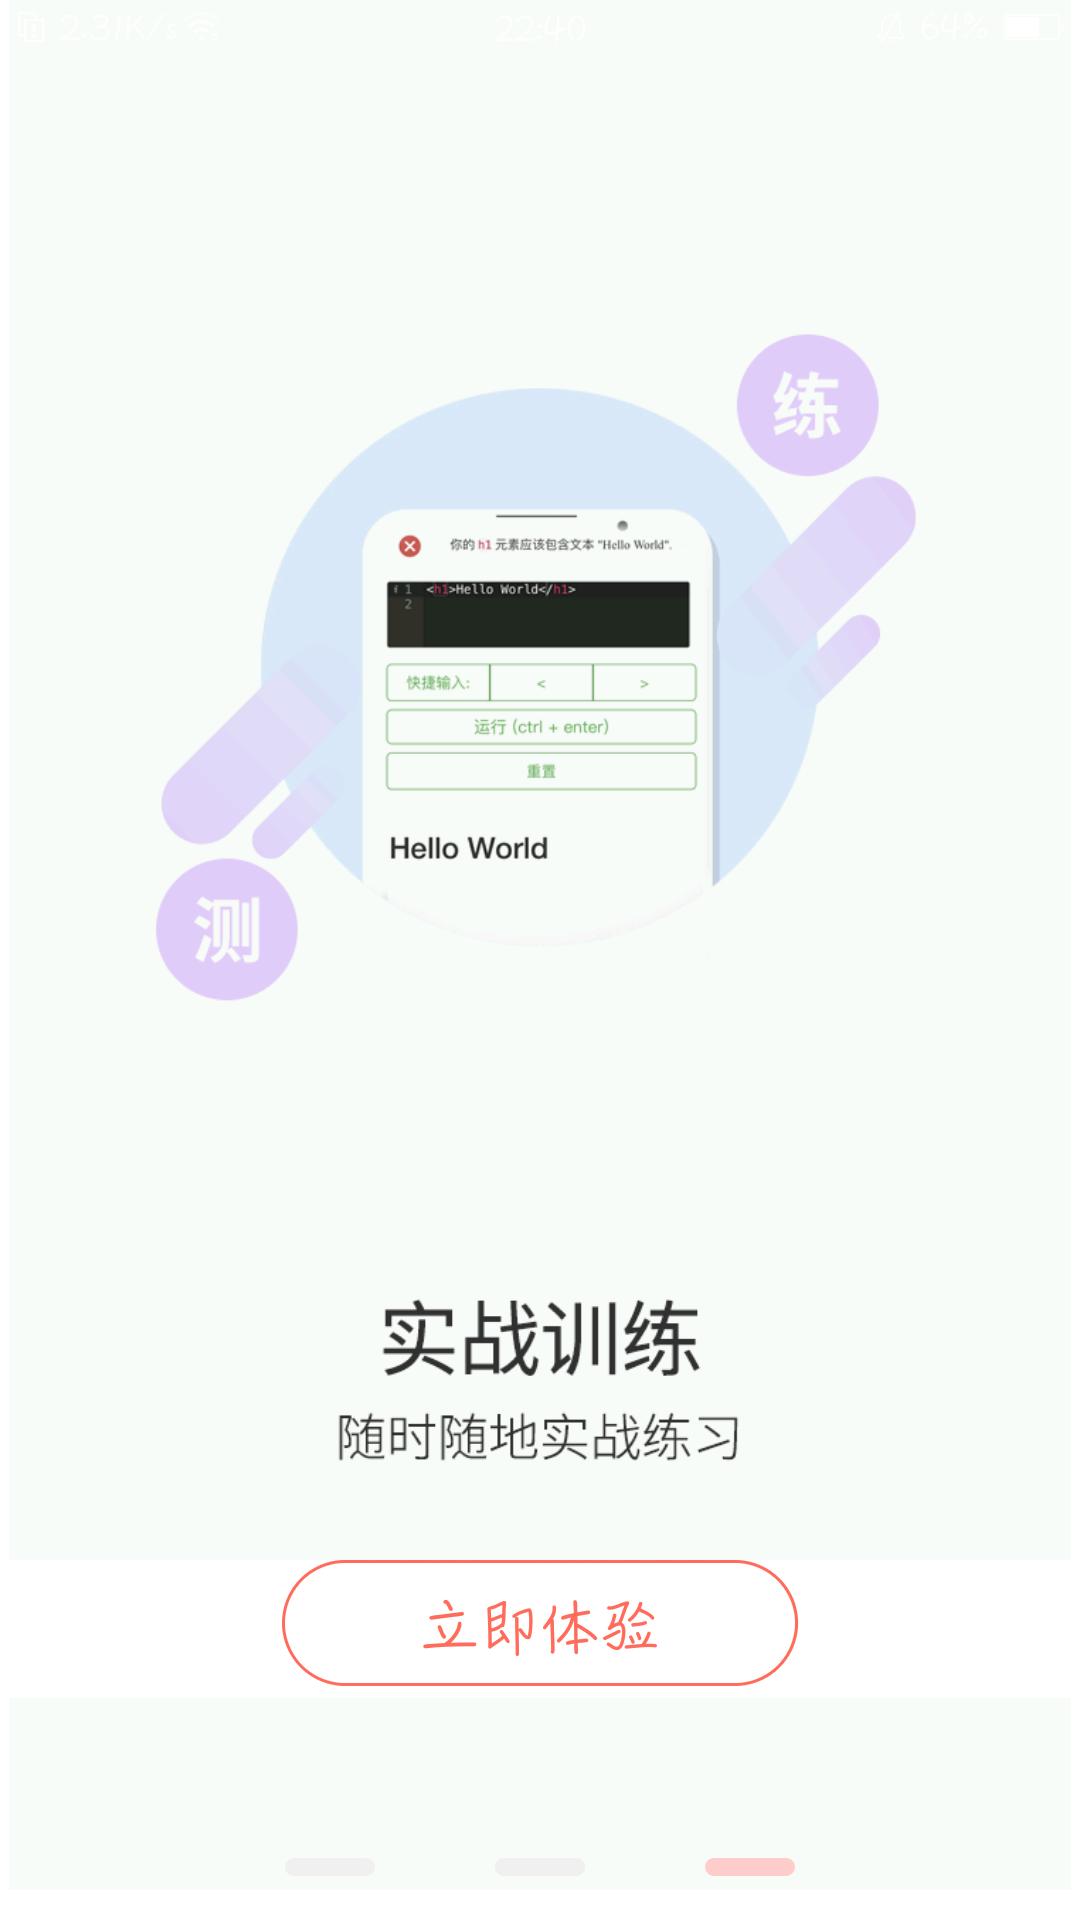 【分享】w3cschool 3.2.2-爱小助